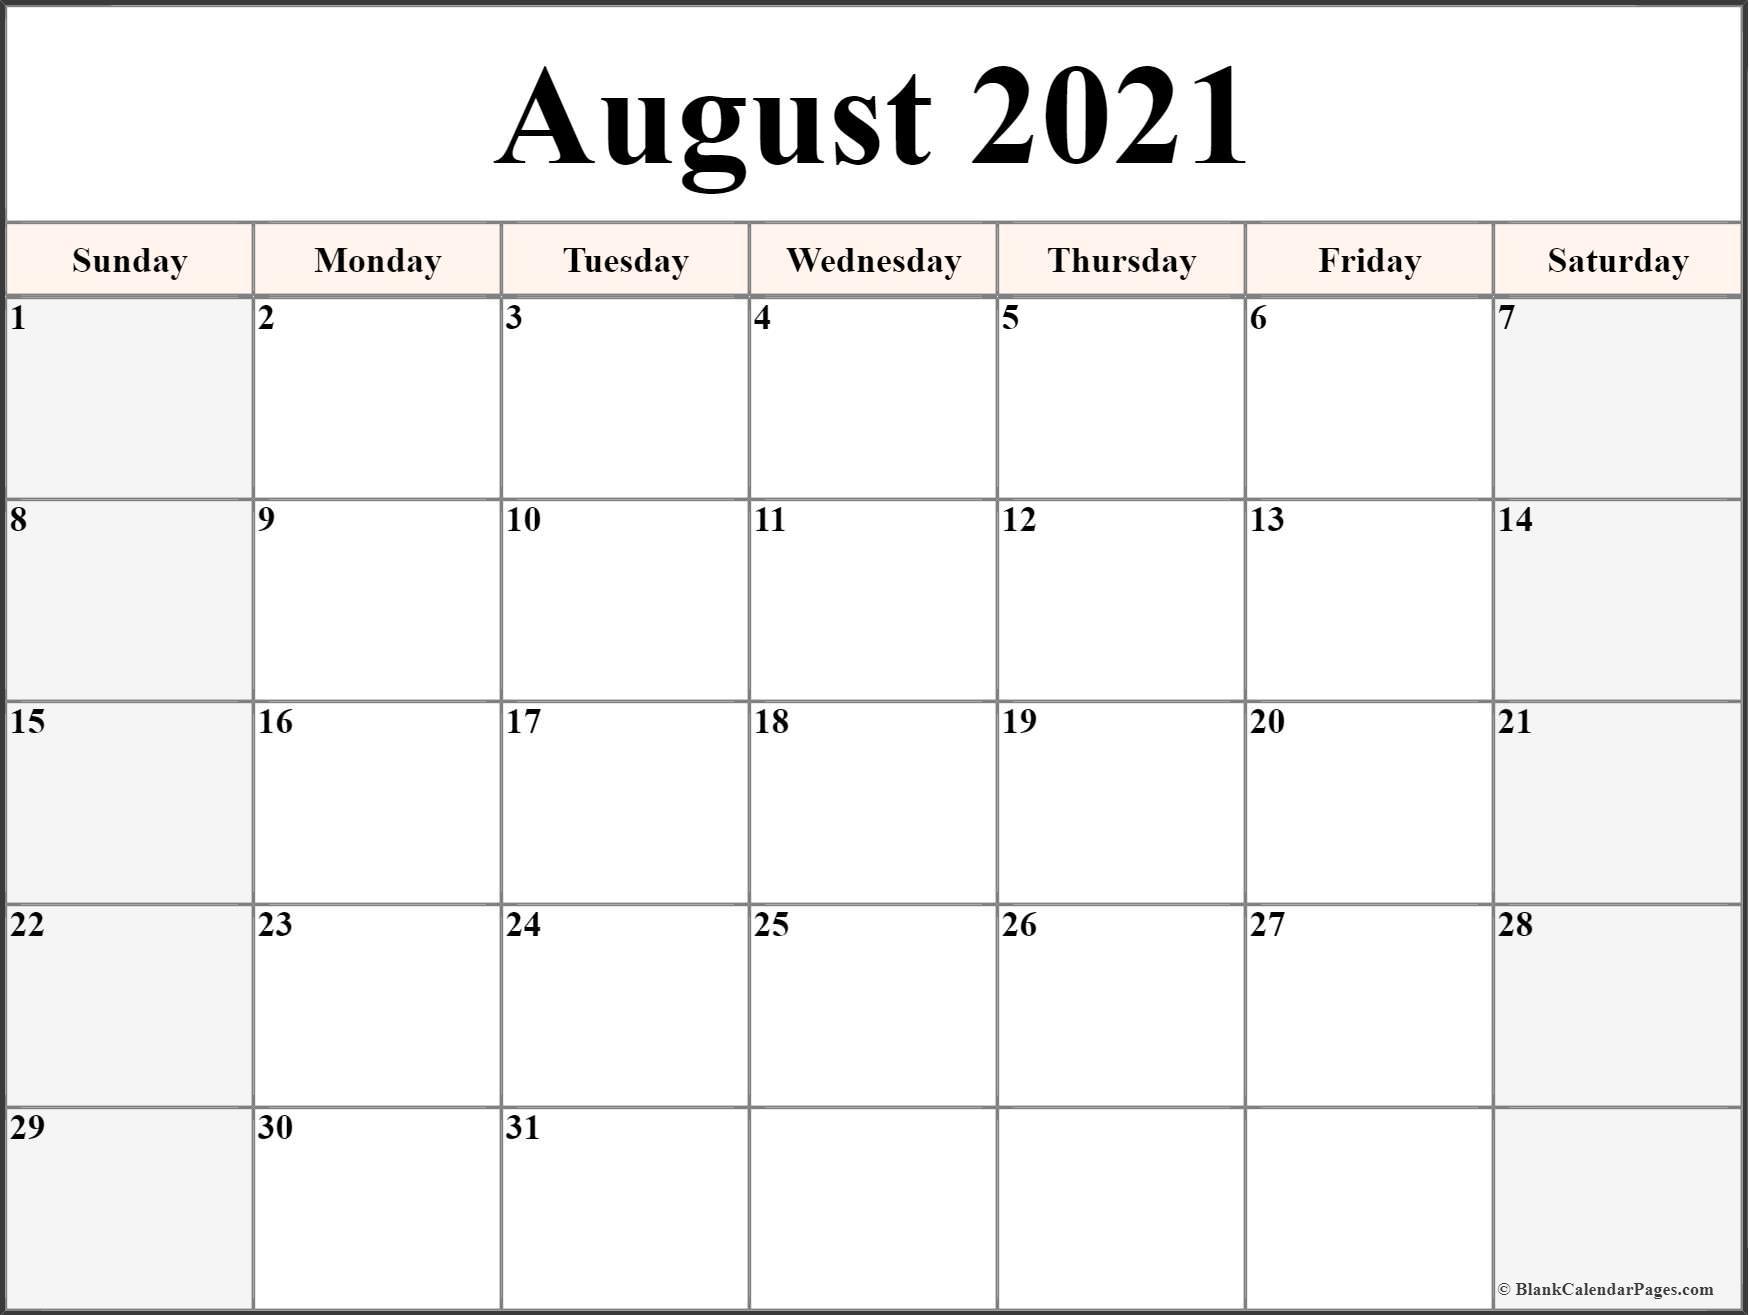 August 2021 Calendar Free Printable Monthly Calendars 4